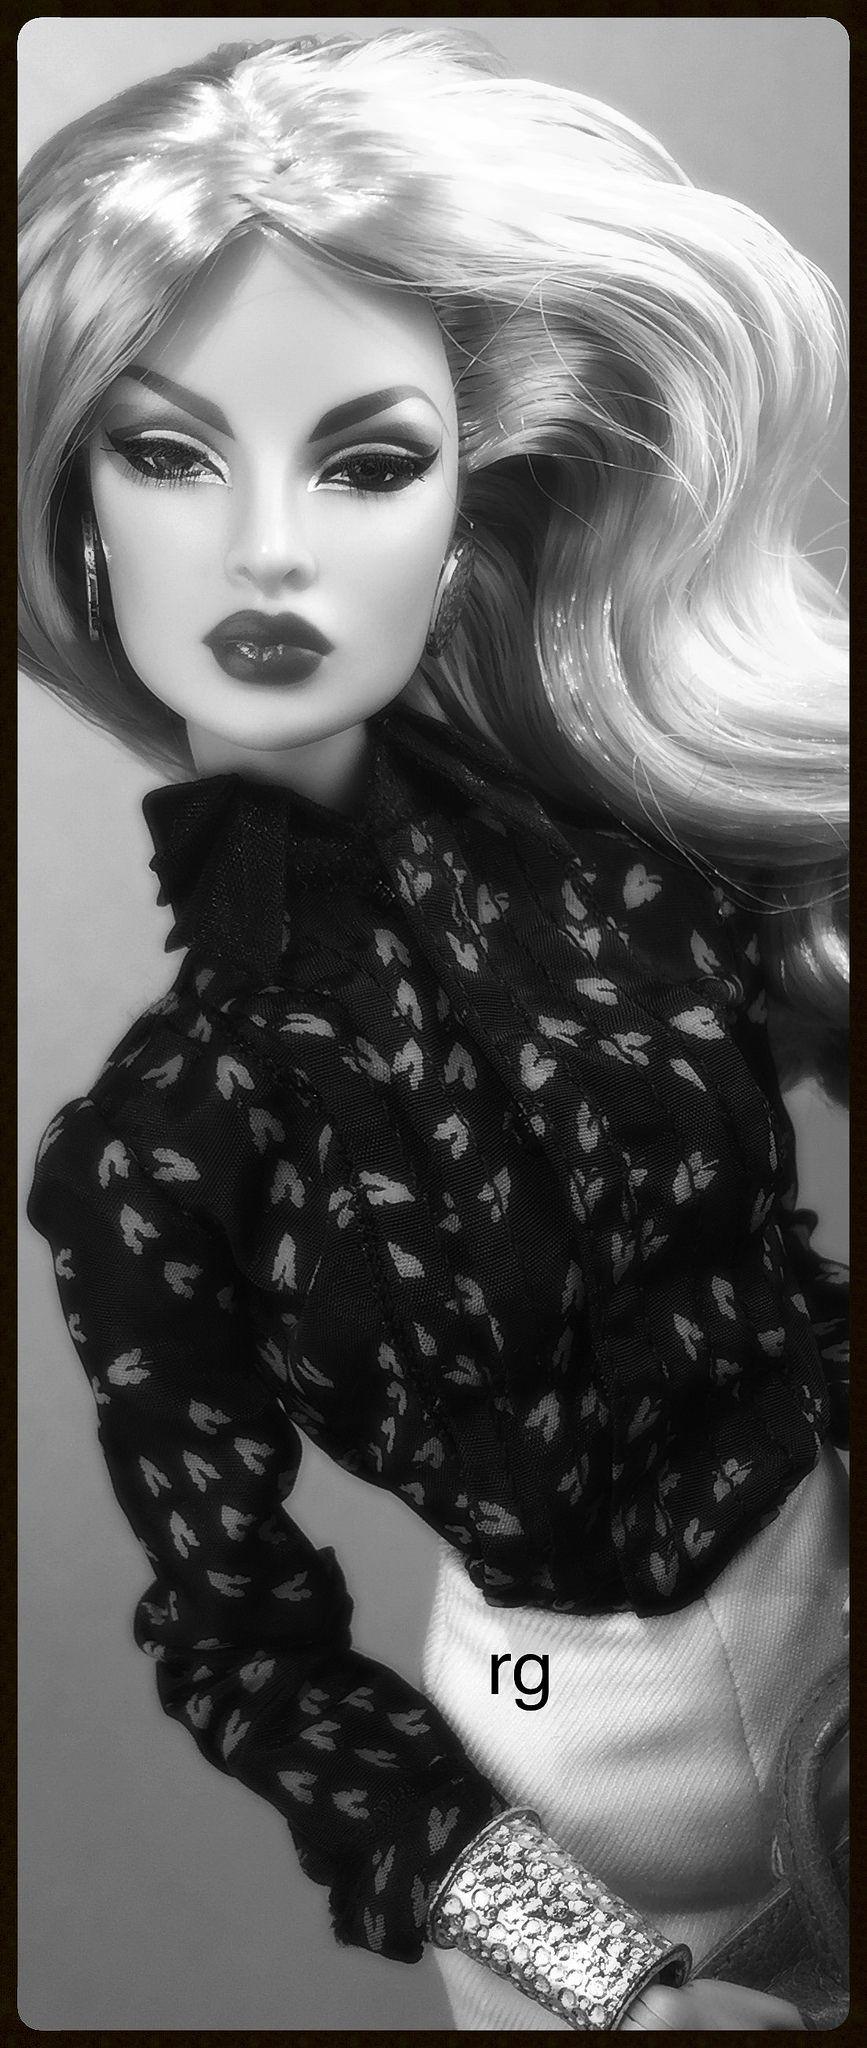 Pin de 💎⚜TERYL⚜💎 em Dolls B⚜️W